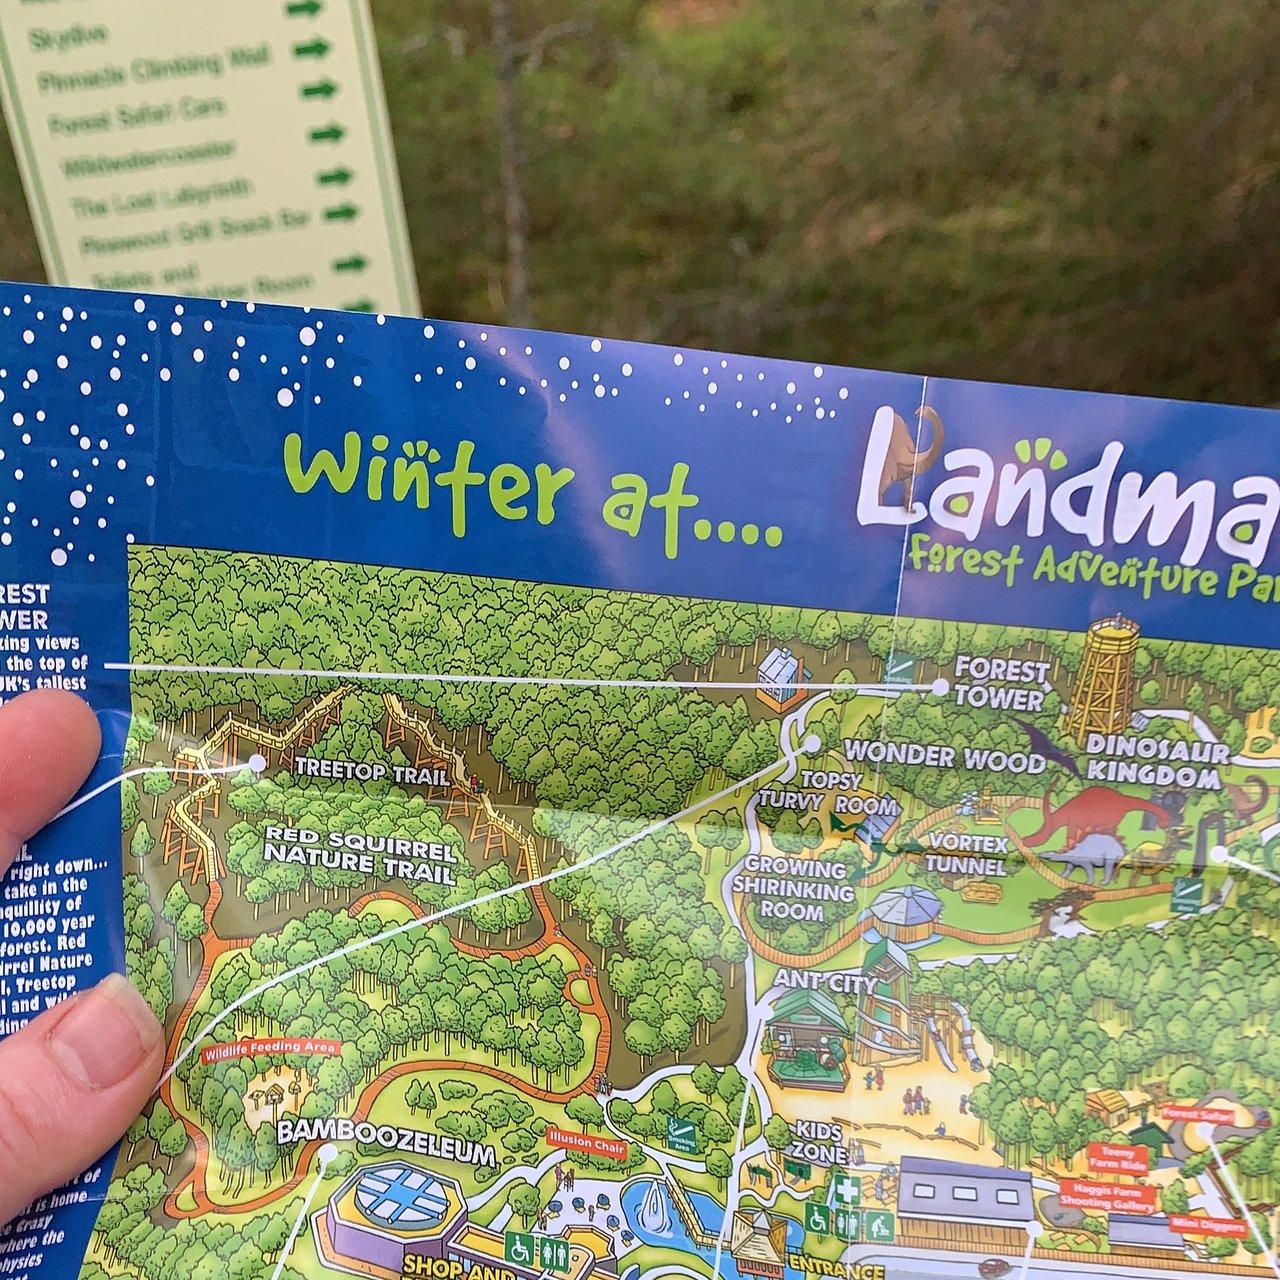 The Runaway Timber Train At Landmark Forest Adventure Park Picture Of Landmark Forest Adventure Park Carrbridge Tripadvisor